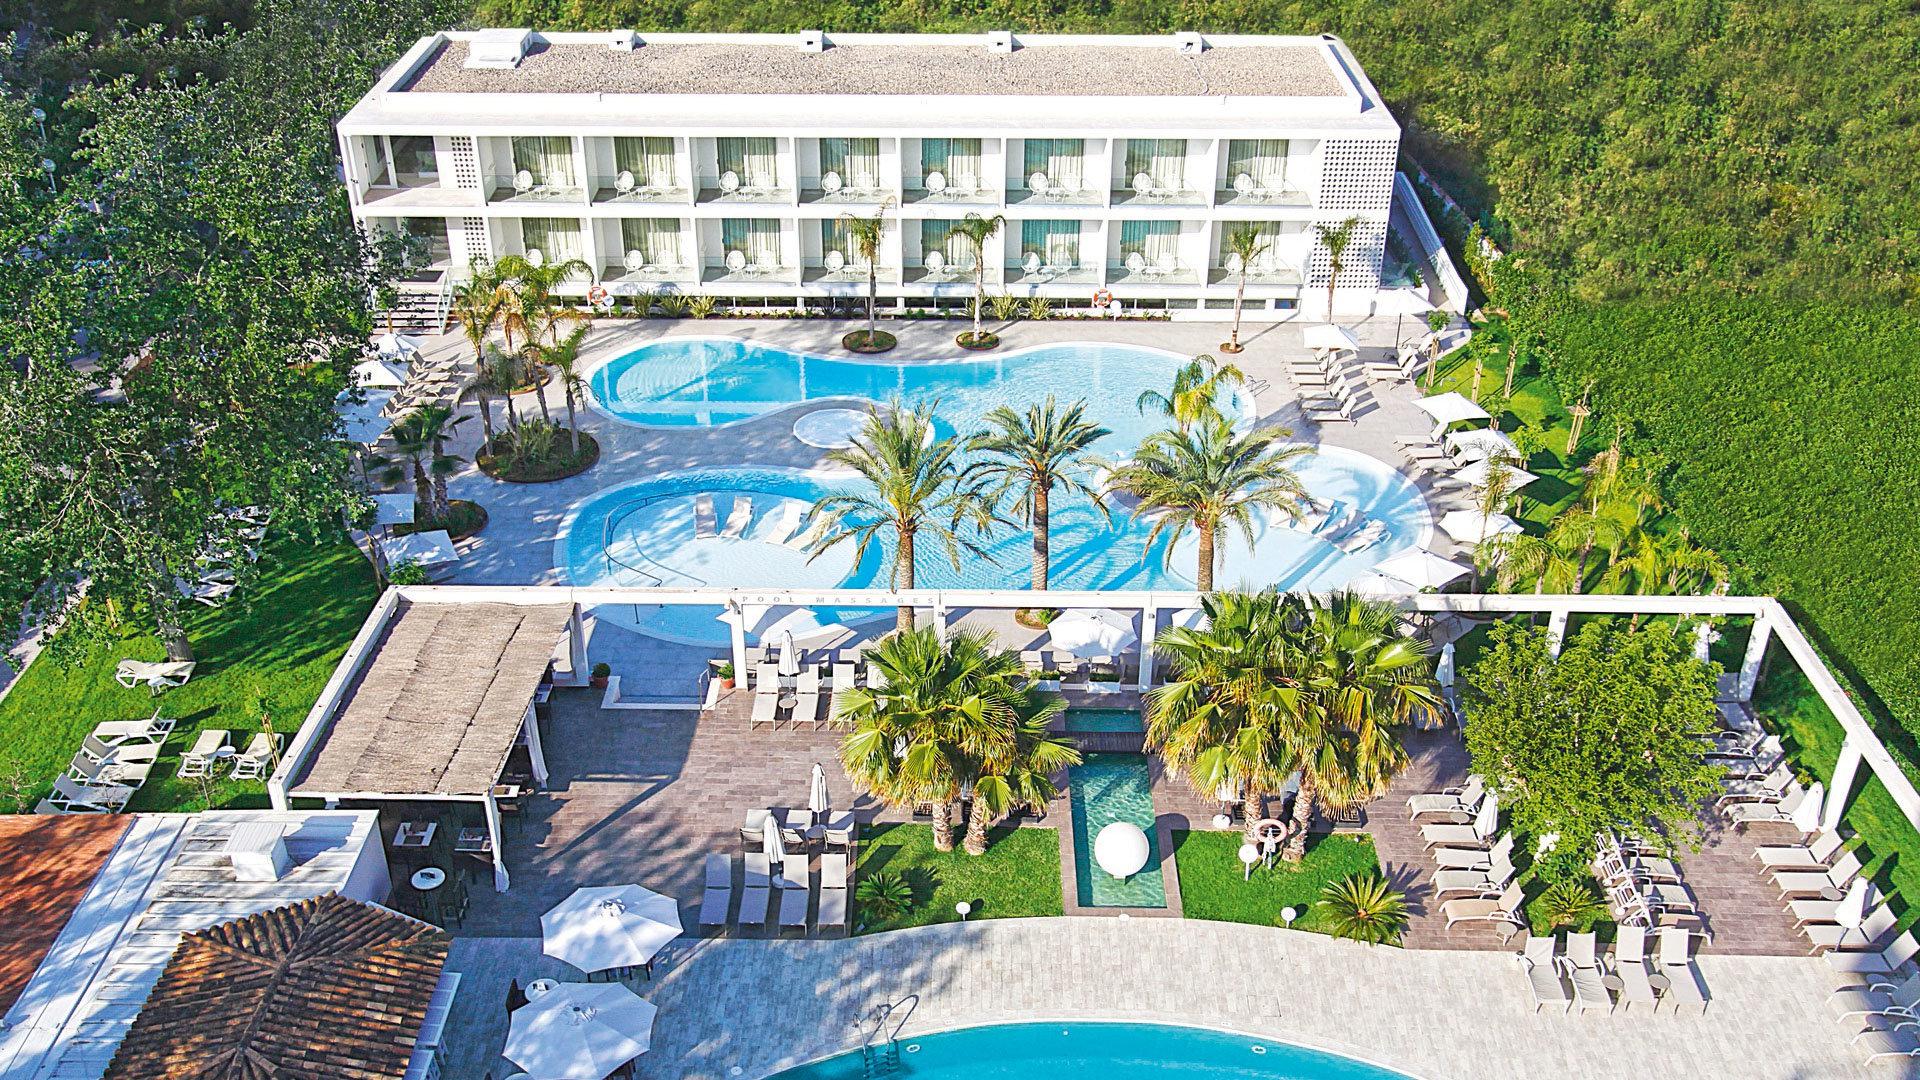 Hotel BG Caballero